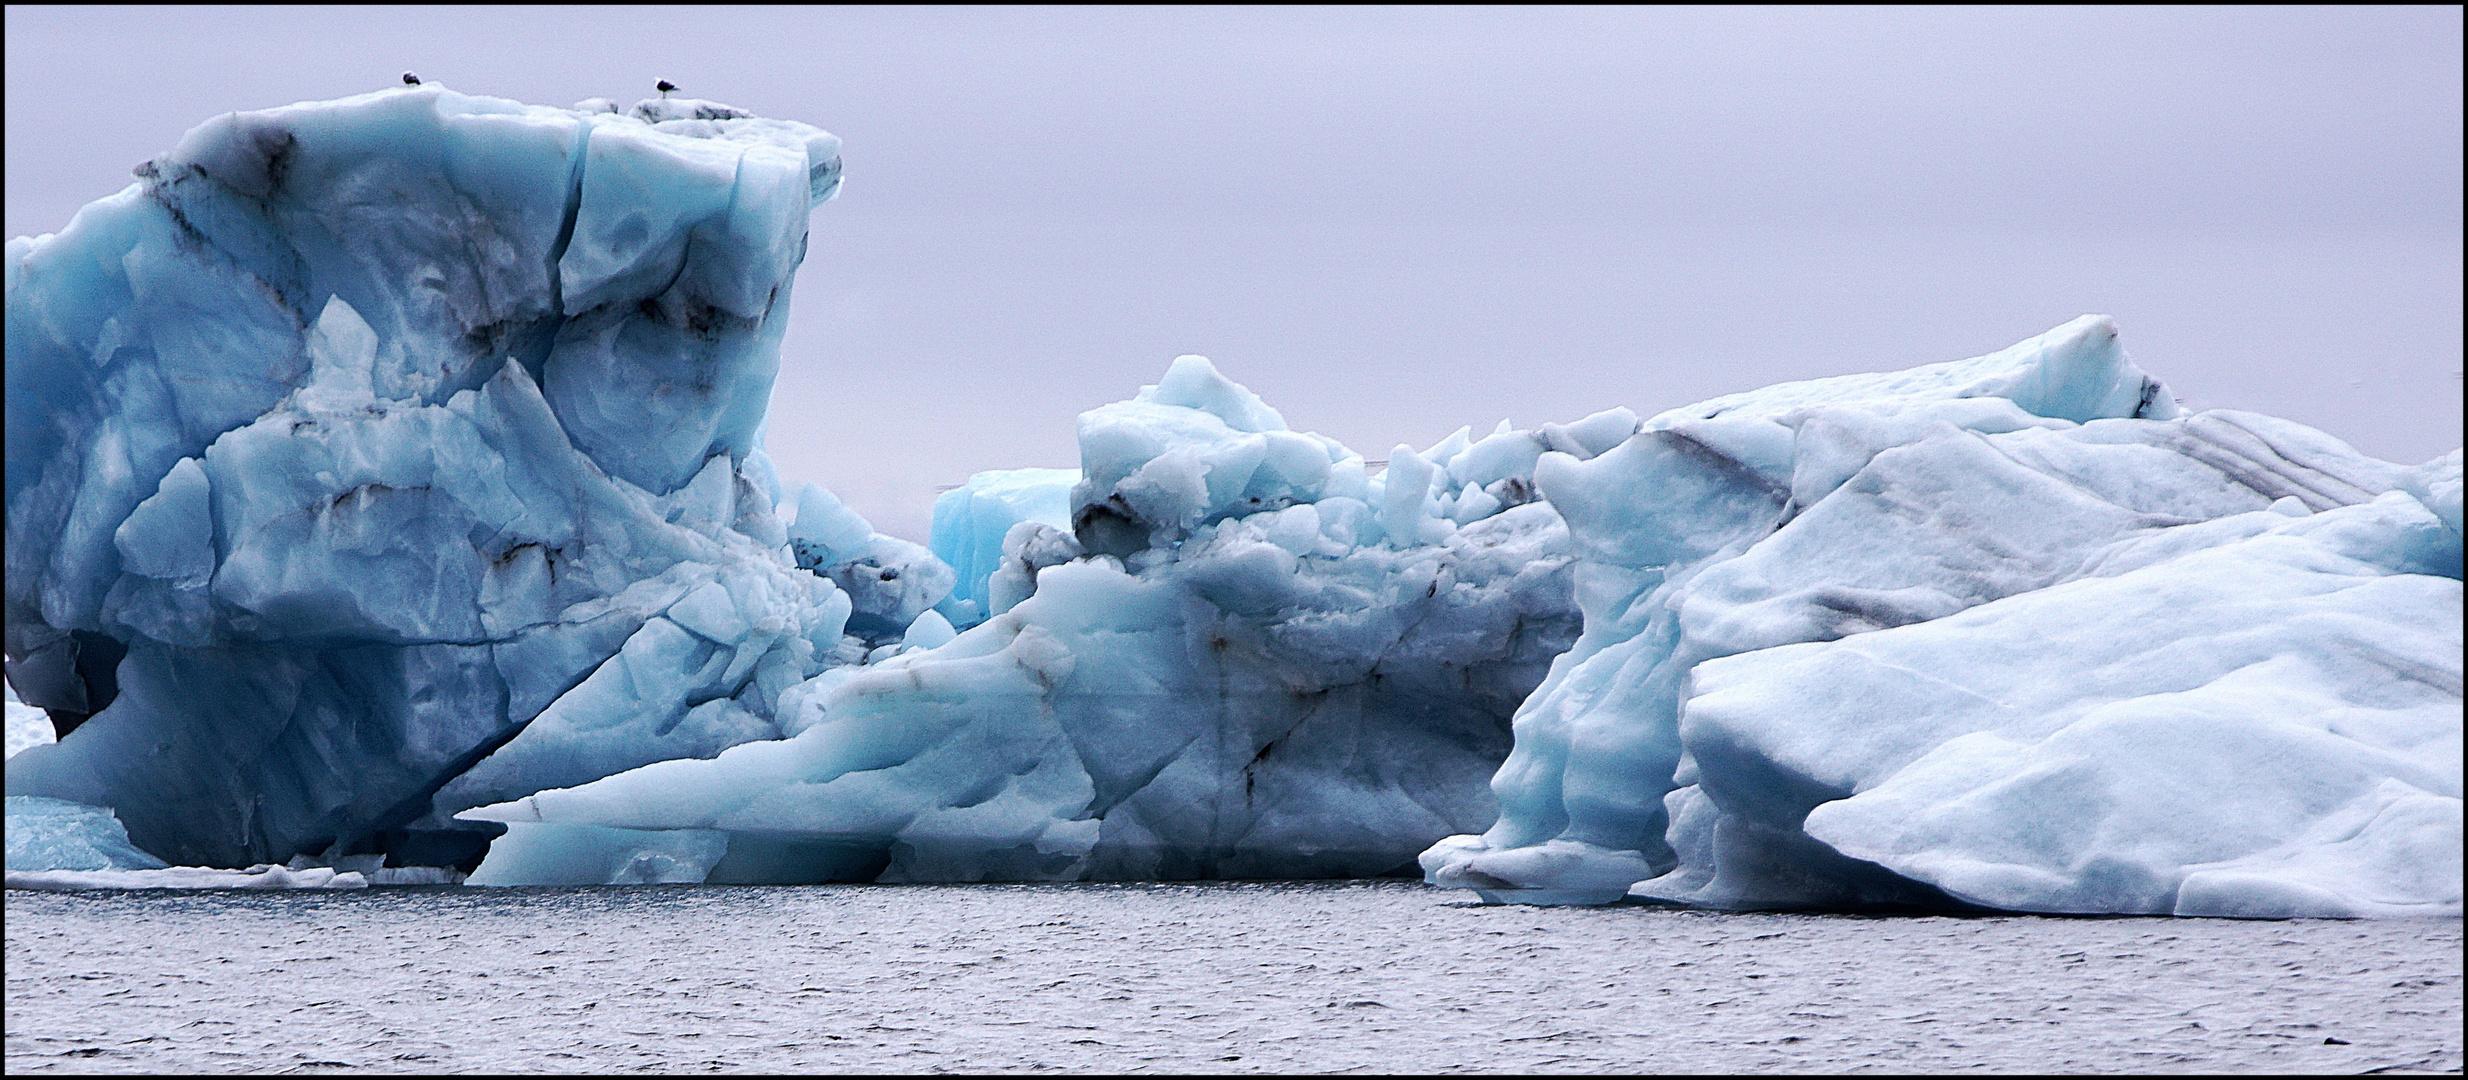 Gletscherlagune Jökulsarlon (Iceland) 2